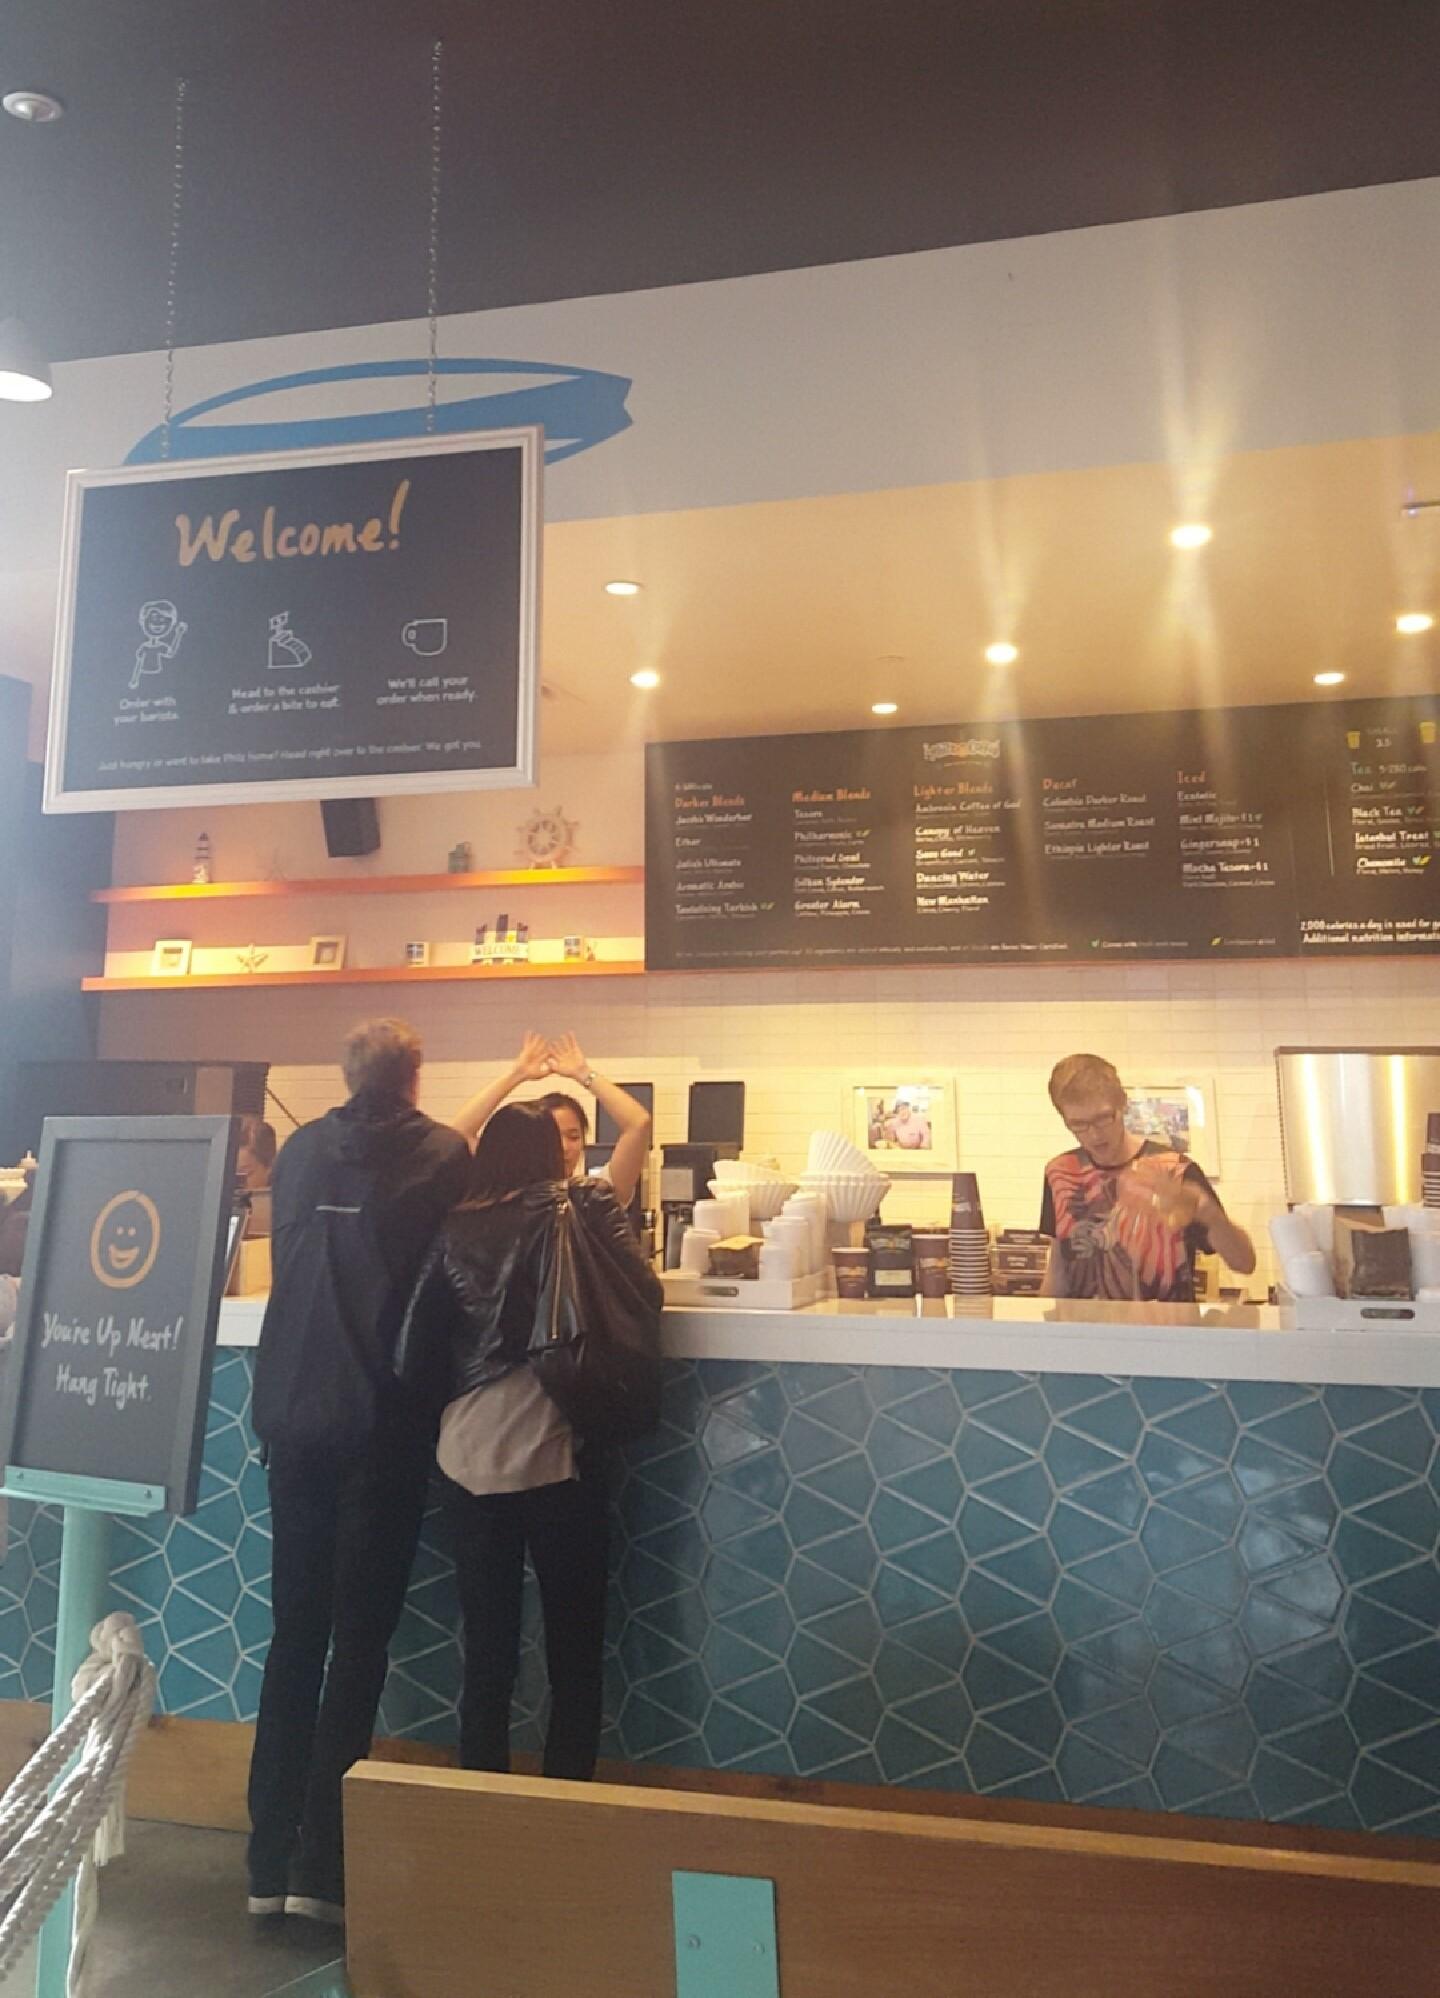 Philz Coffee in Huntington Beach